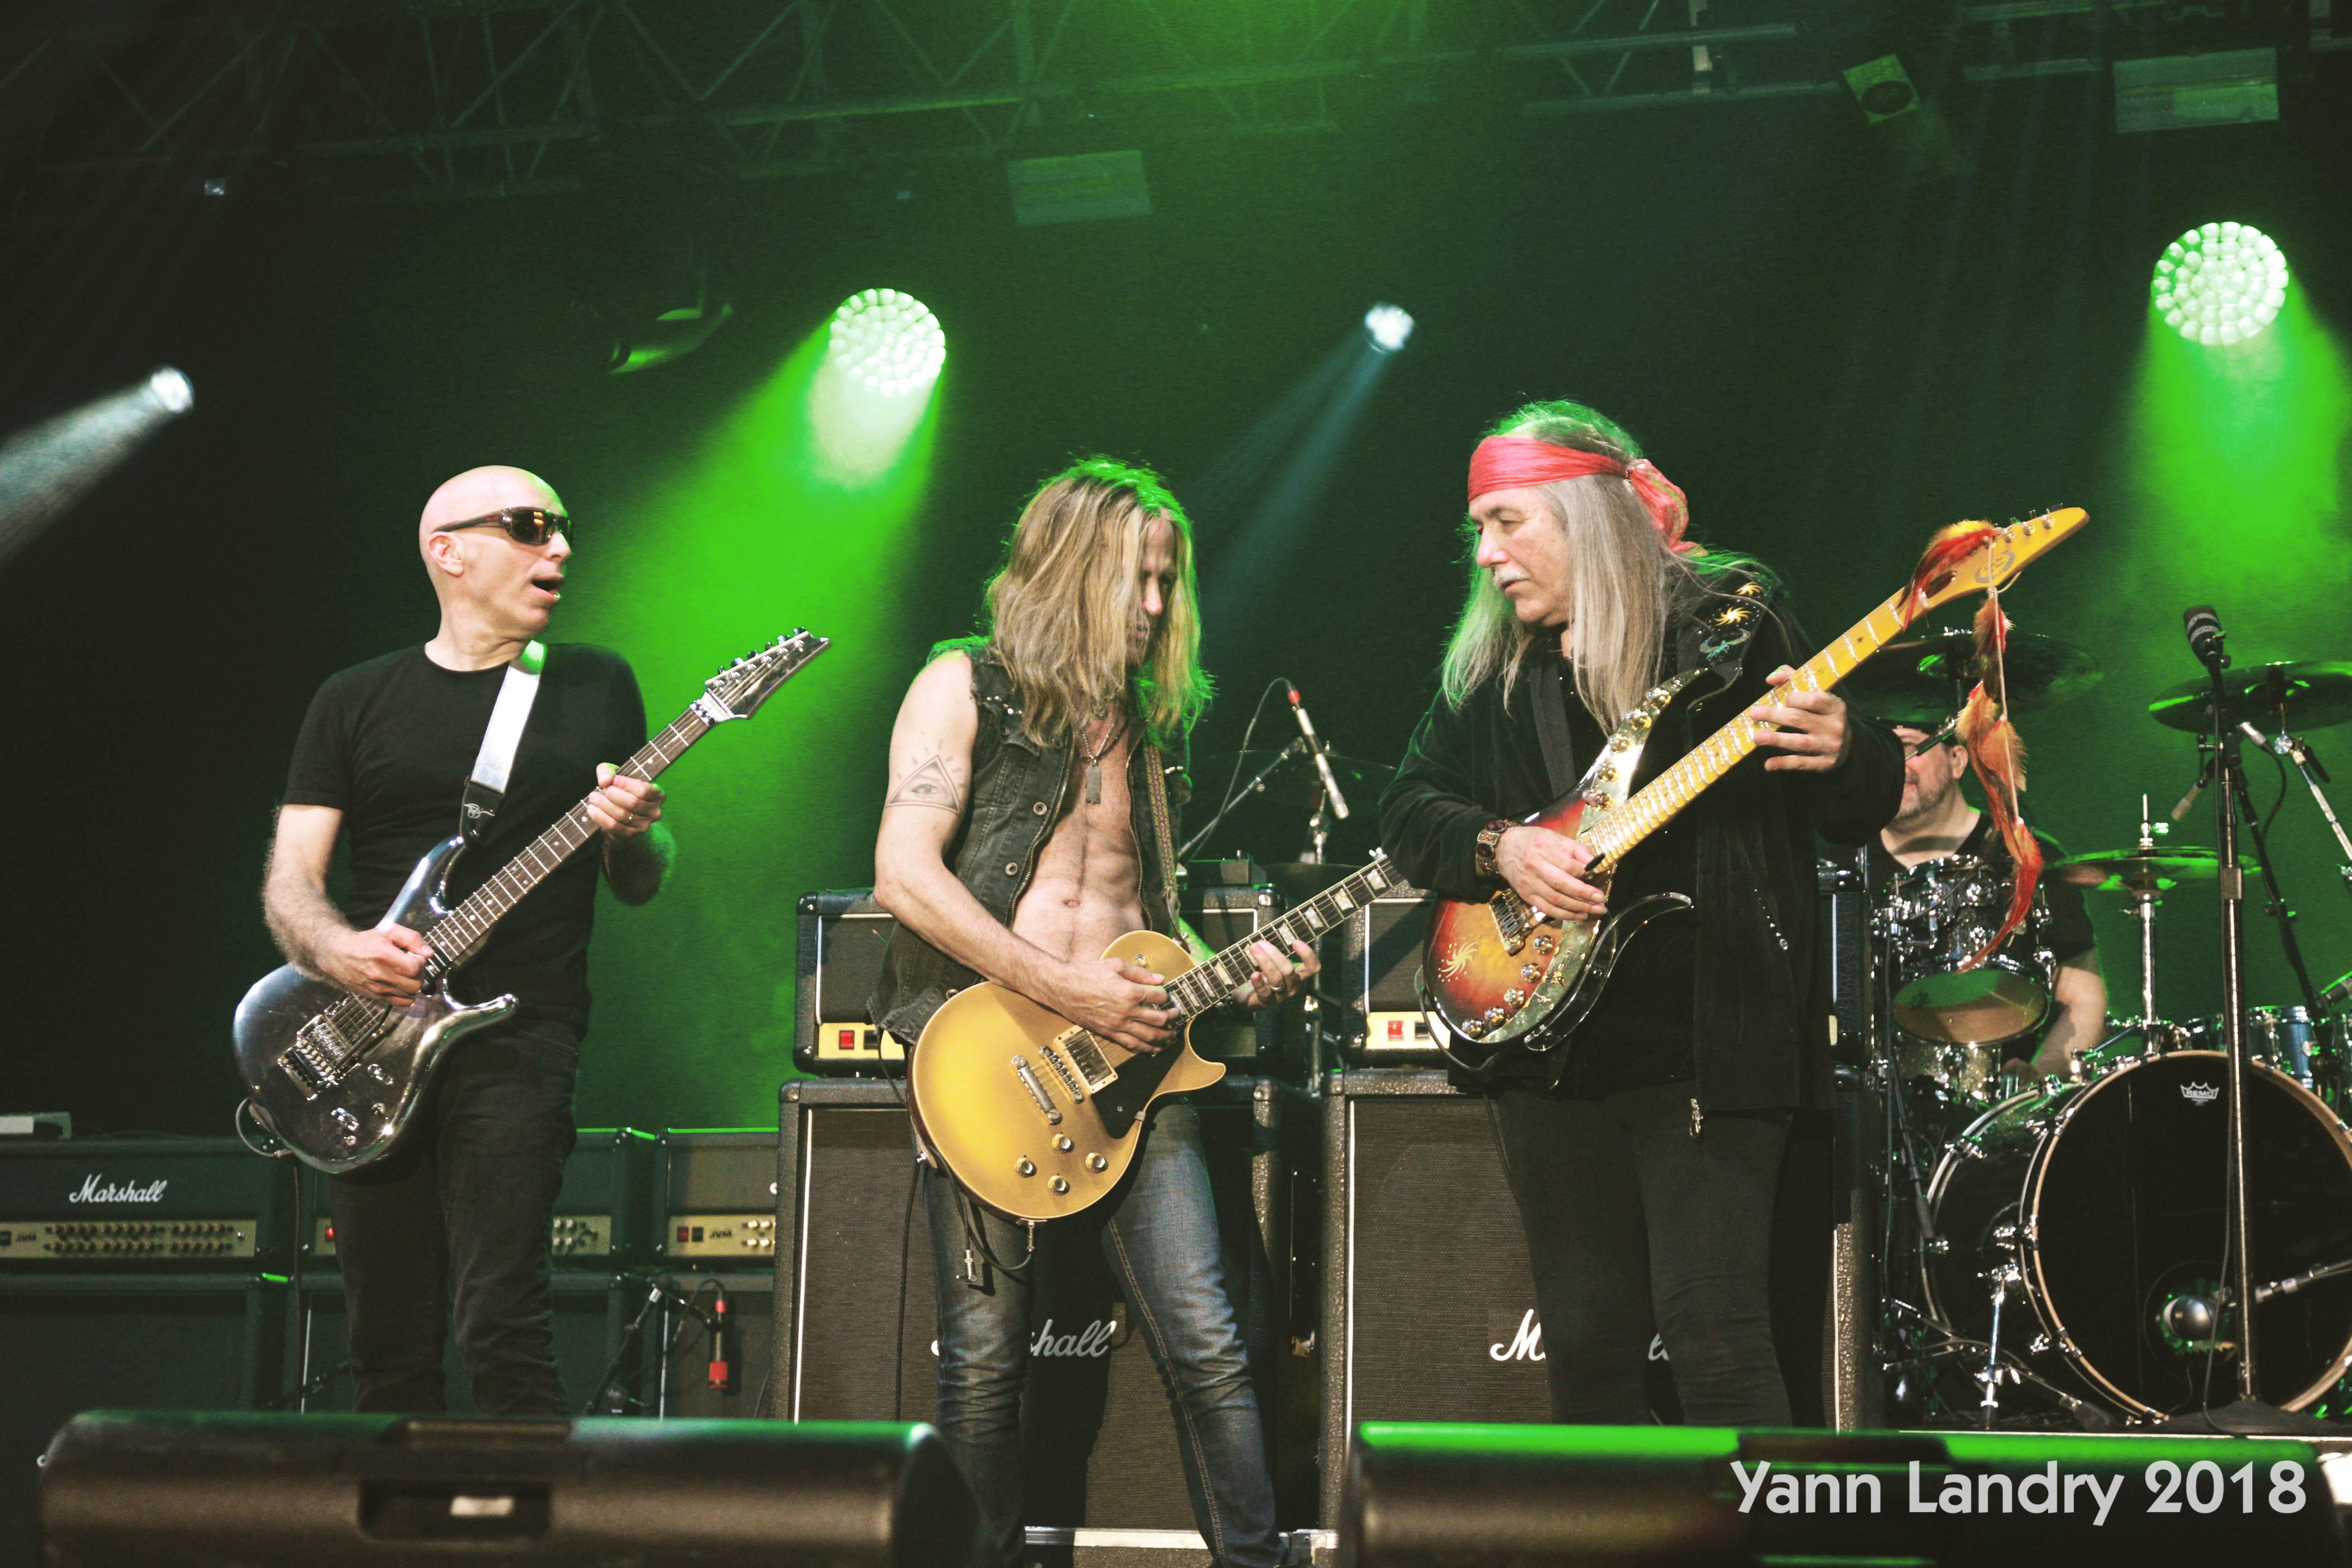 Joe Satriani, Doug Aldrich, Uli Jon Roth, G3, Grenouille, Pépé vicieux, Manowar, Motul